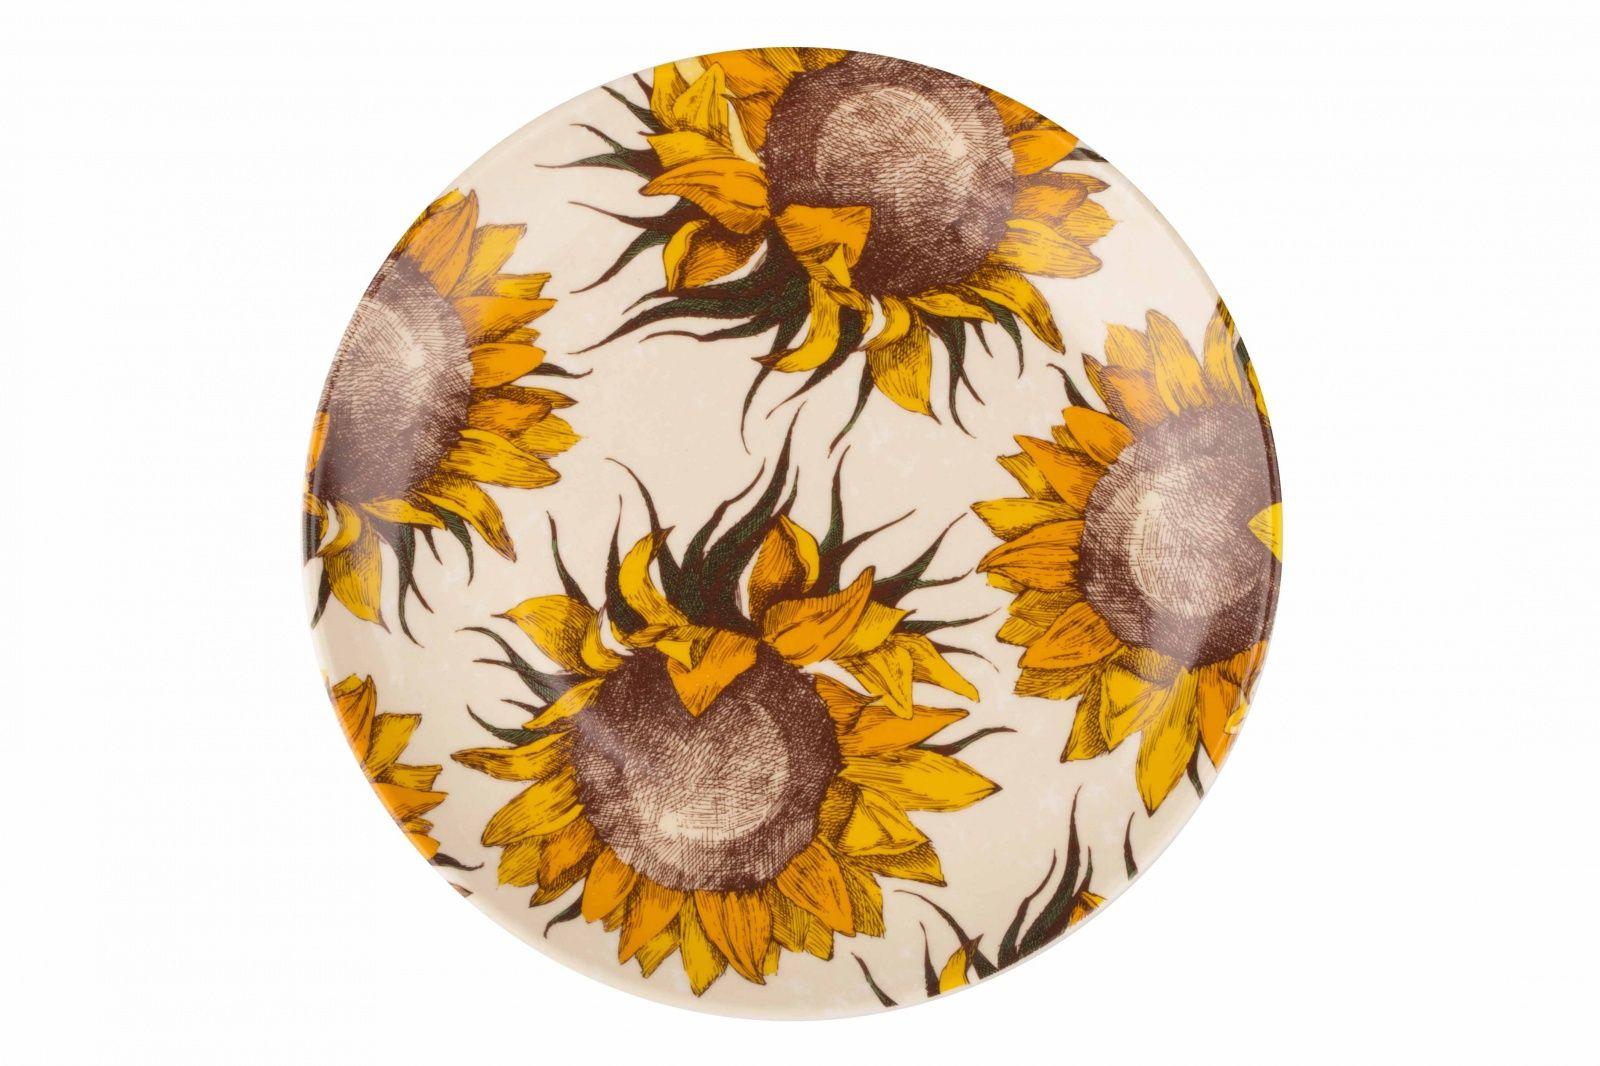 Dulevo porcelain / Plate 210 mm Sunflowers (Ceramics)